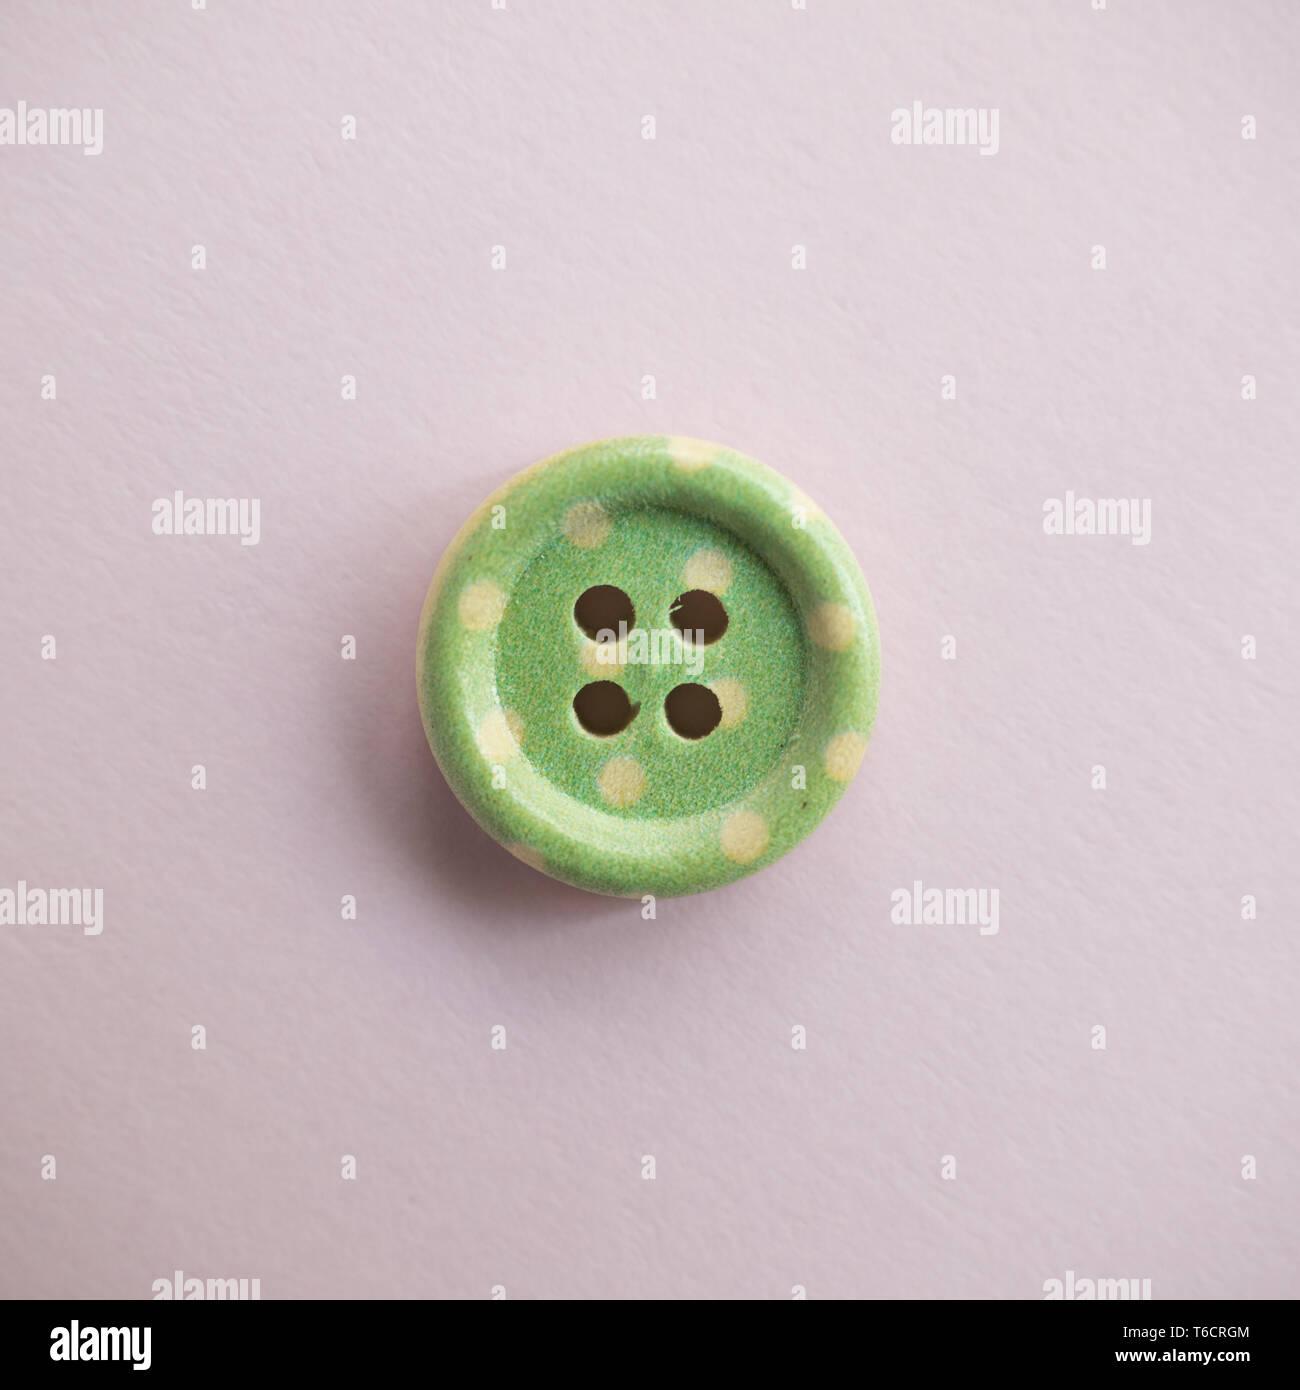 Botón de madera aislados con coloridos puntos de color rosa claro, costura de fondo Foto de stock